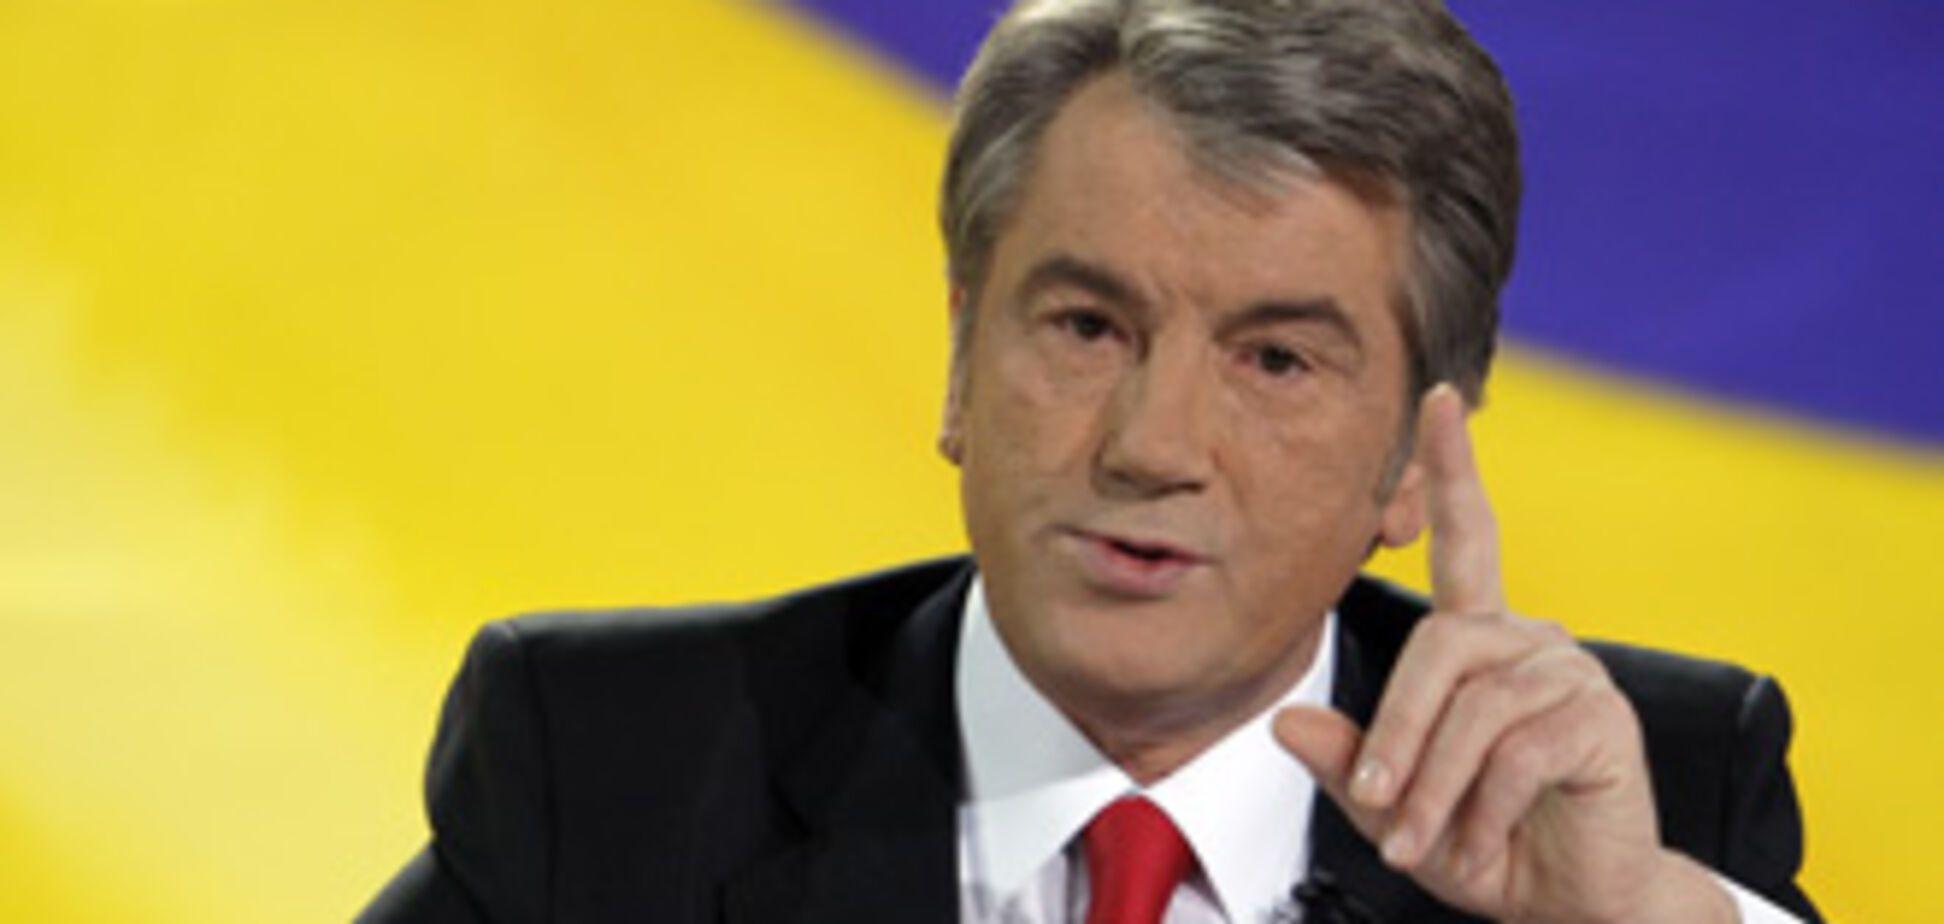 Ющенко и 'Наша Украина' засели в 'Киевпроекте'